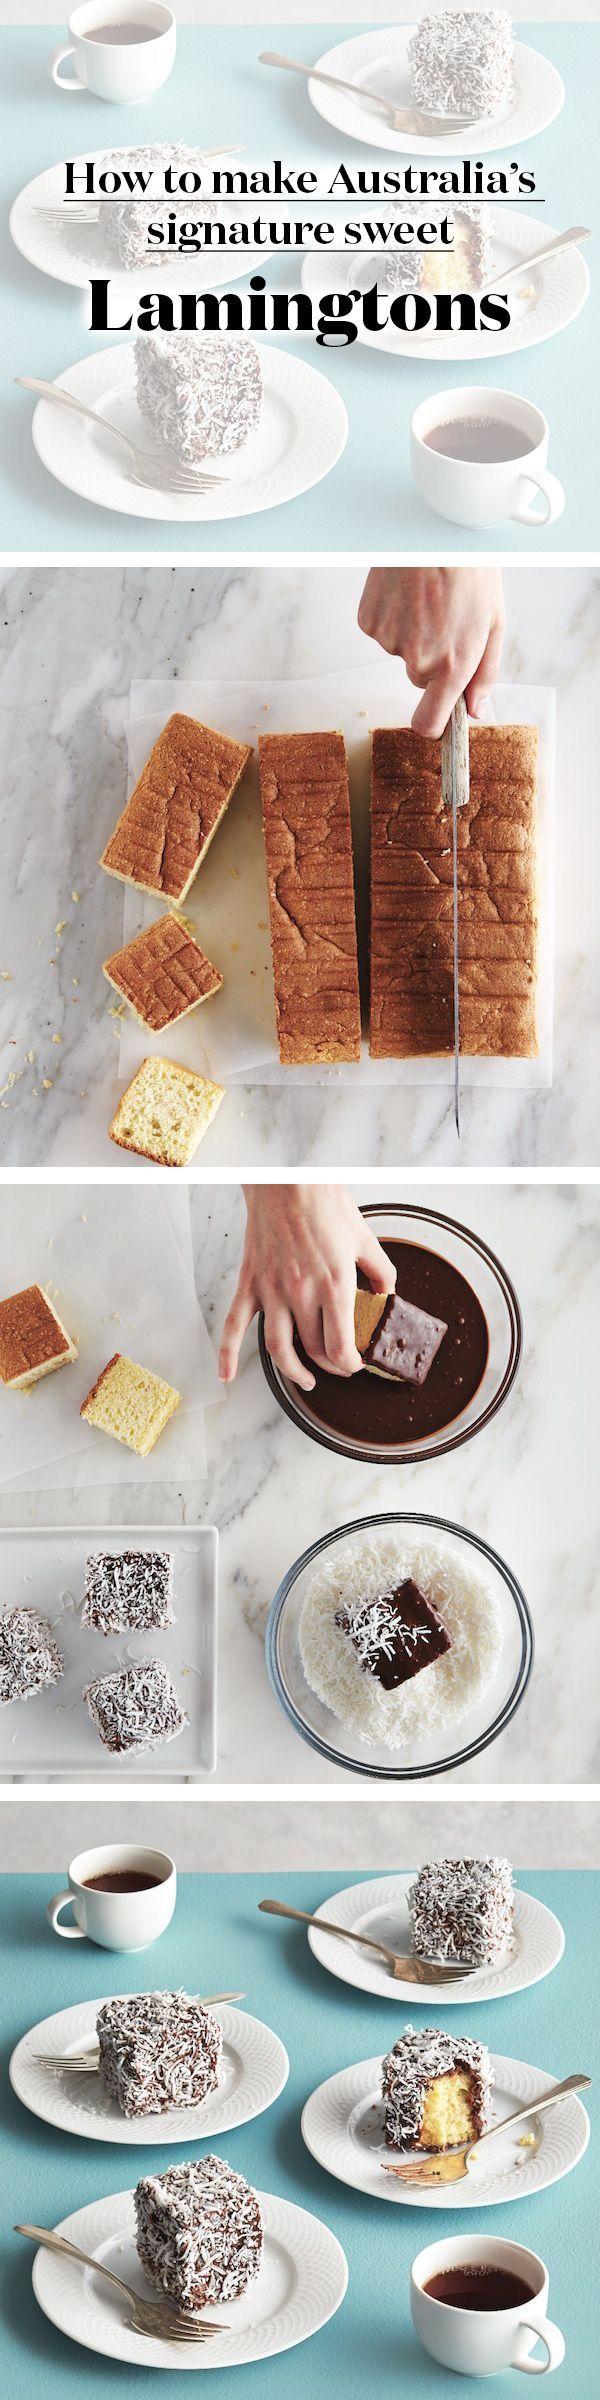 How To Make Australia's Signature Sweet Lamingtons